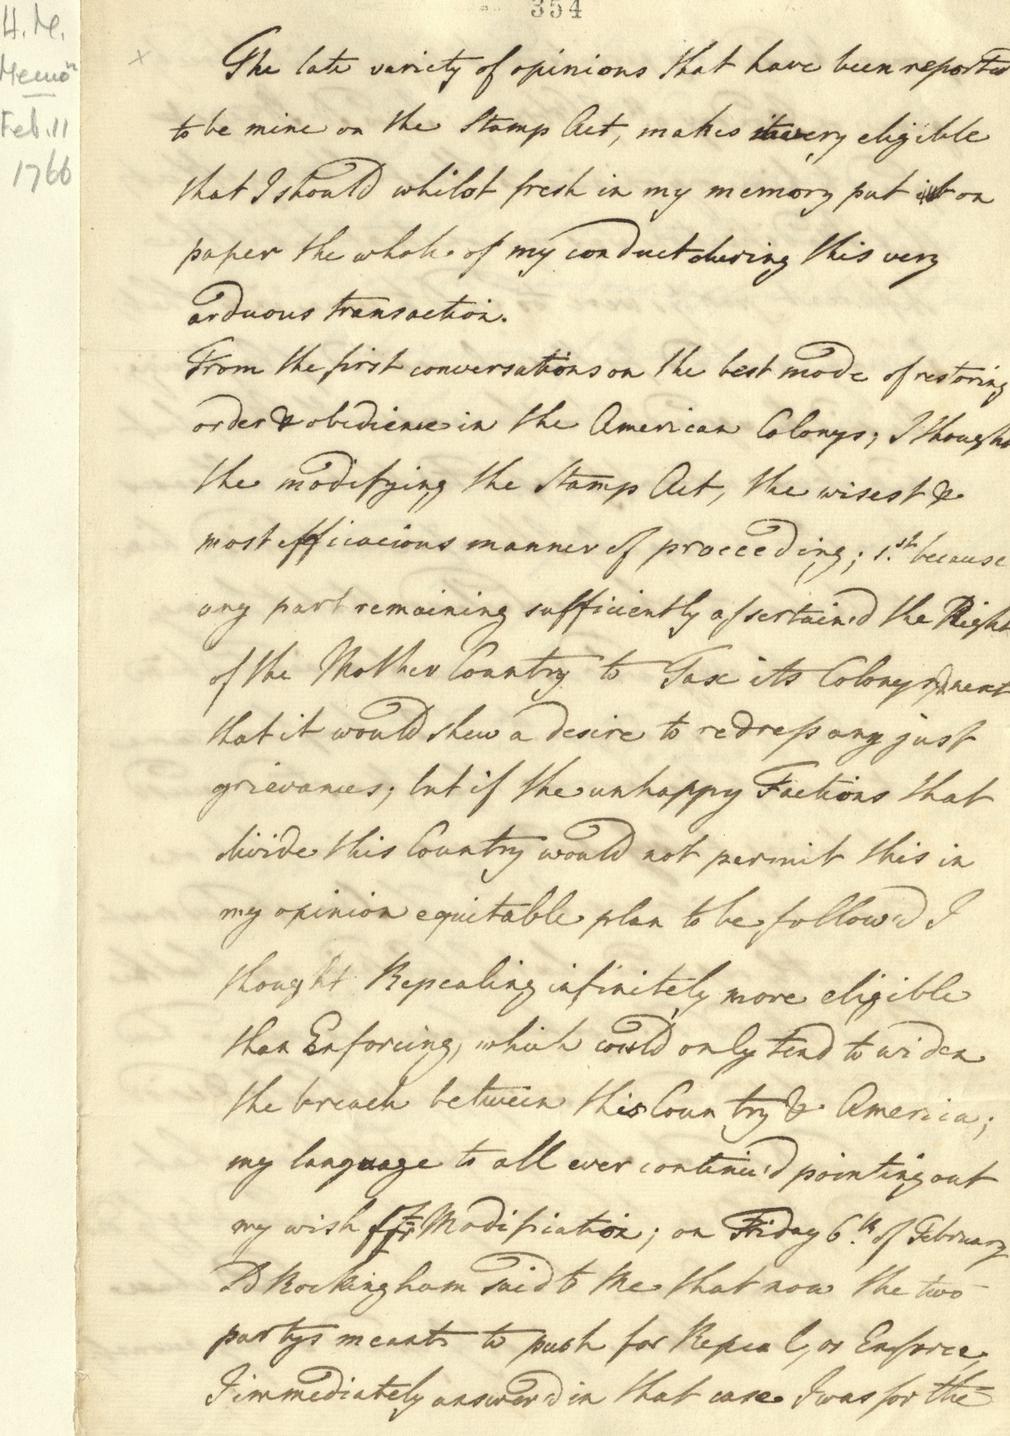 Written memorandum by George III